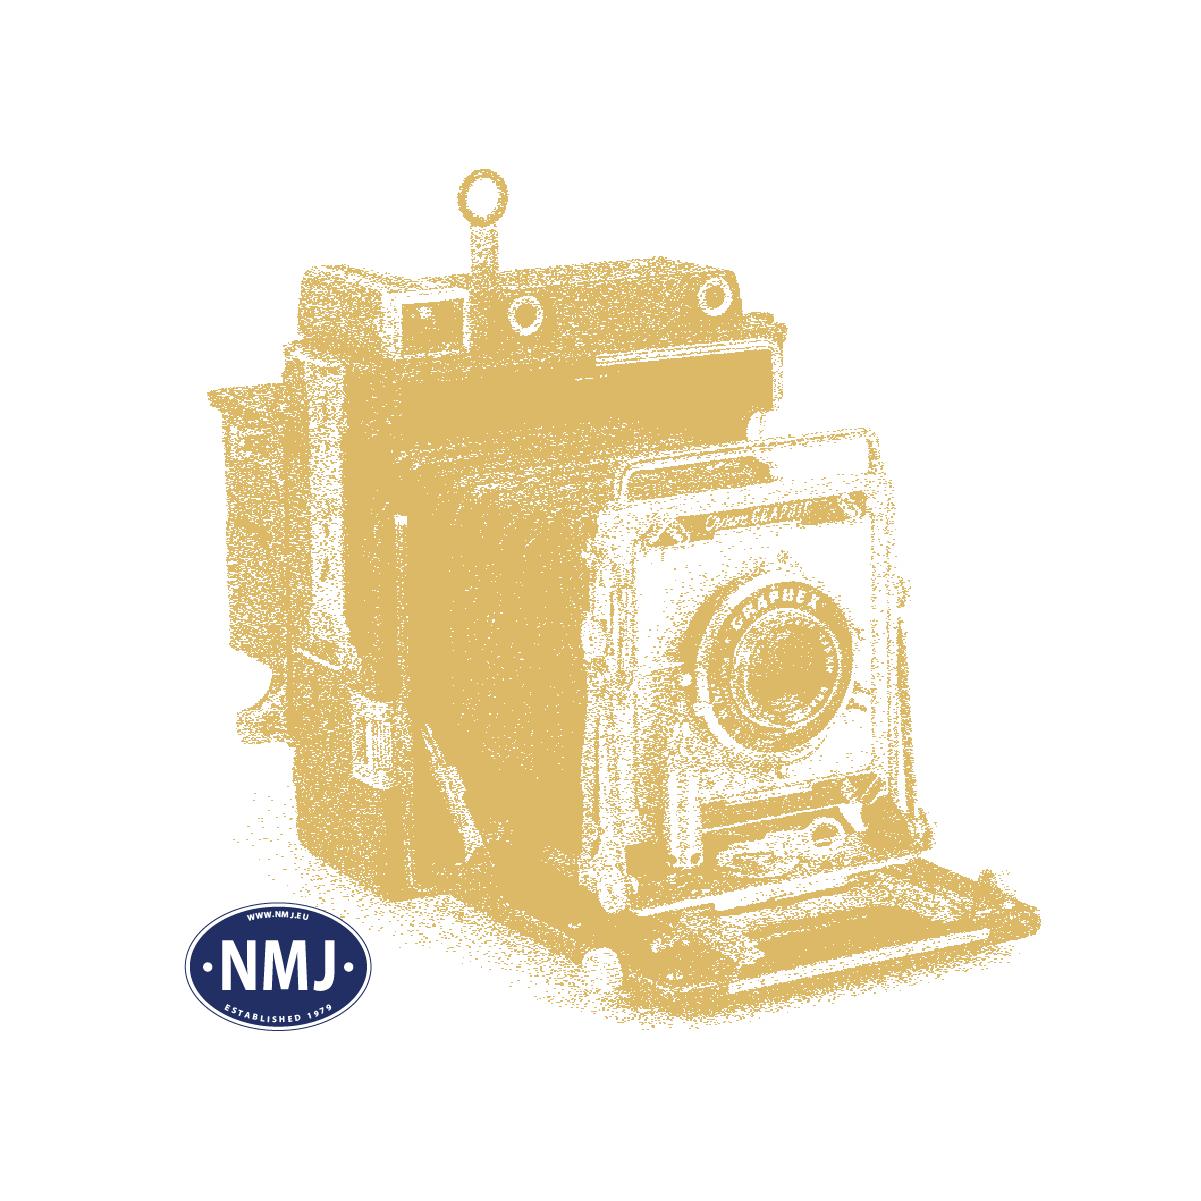 NMJT132.301 - NMJ Topline NSB B4 25957, Nydesign